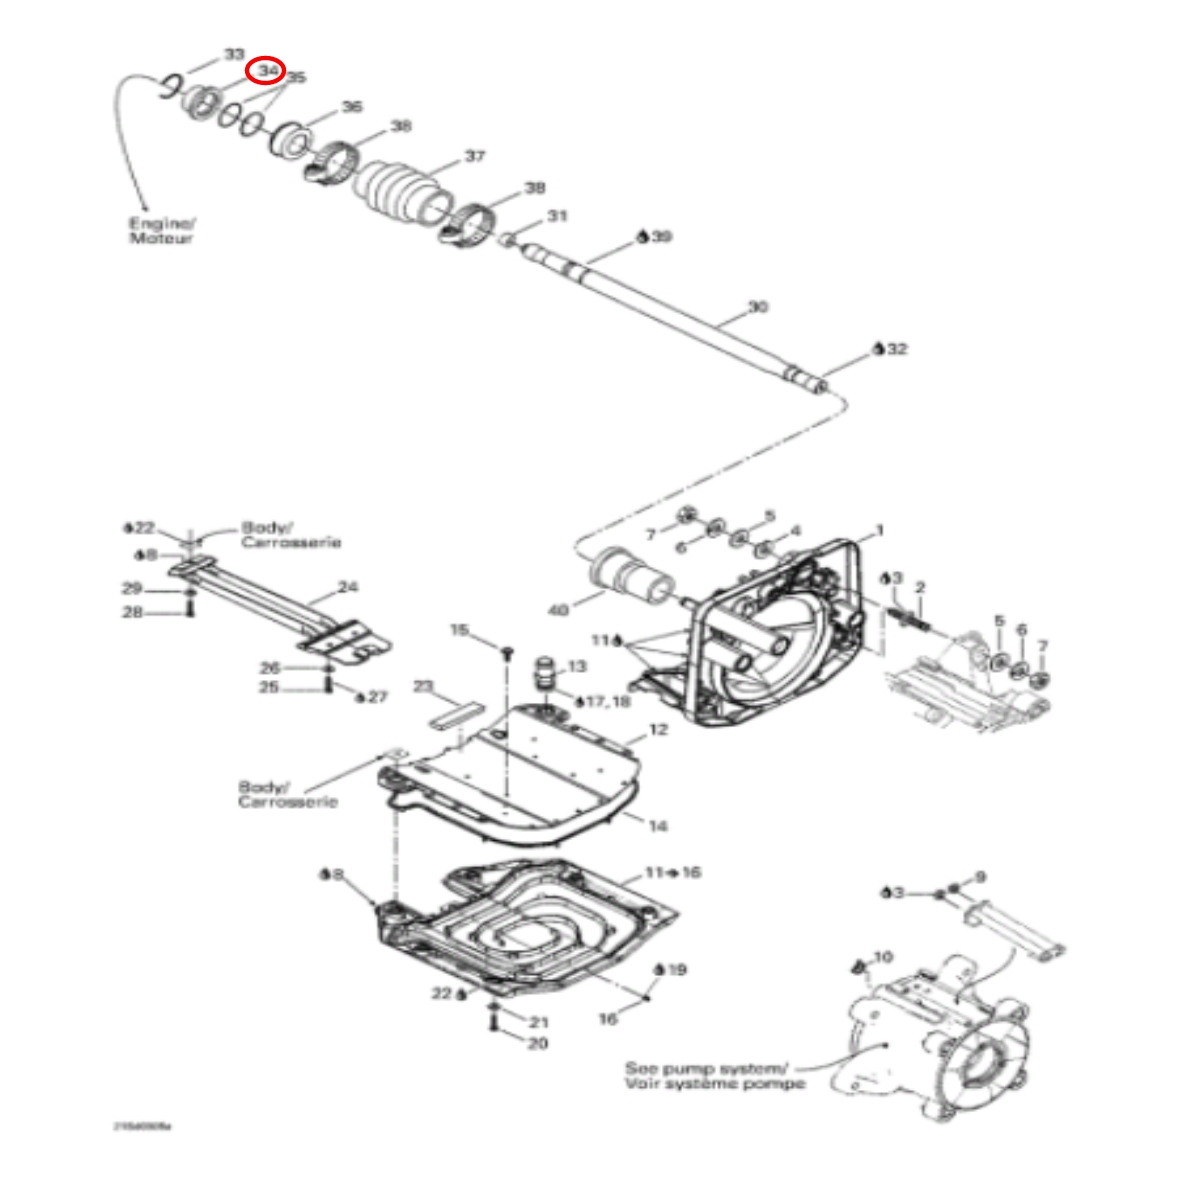 Bucha Inox Anel Carbono para Jet Ski Sea Doo 4 TEC RXP/GTR/GTX/RXT (sem rosca)  - Radical Peças - Peças para Jet Ski